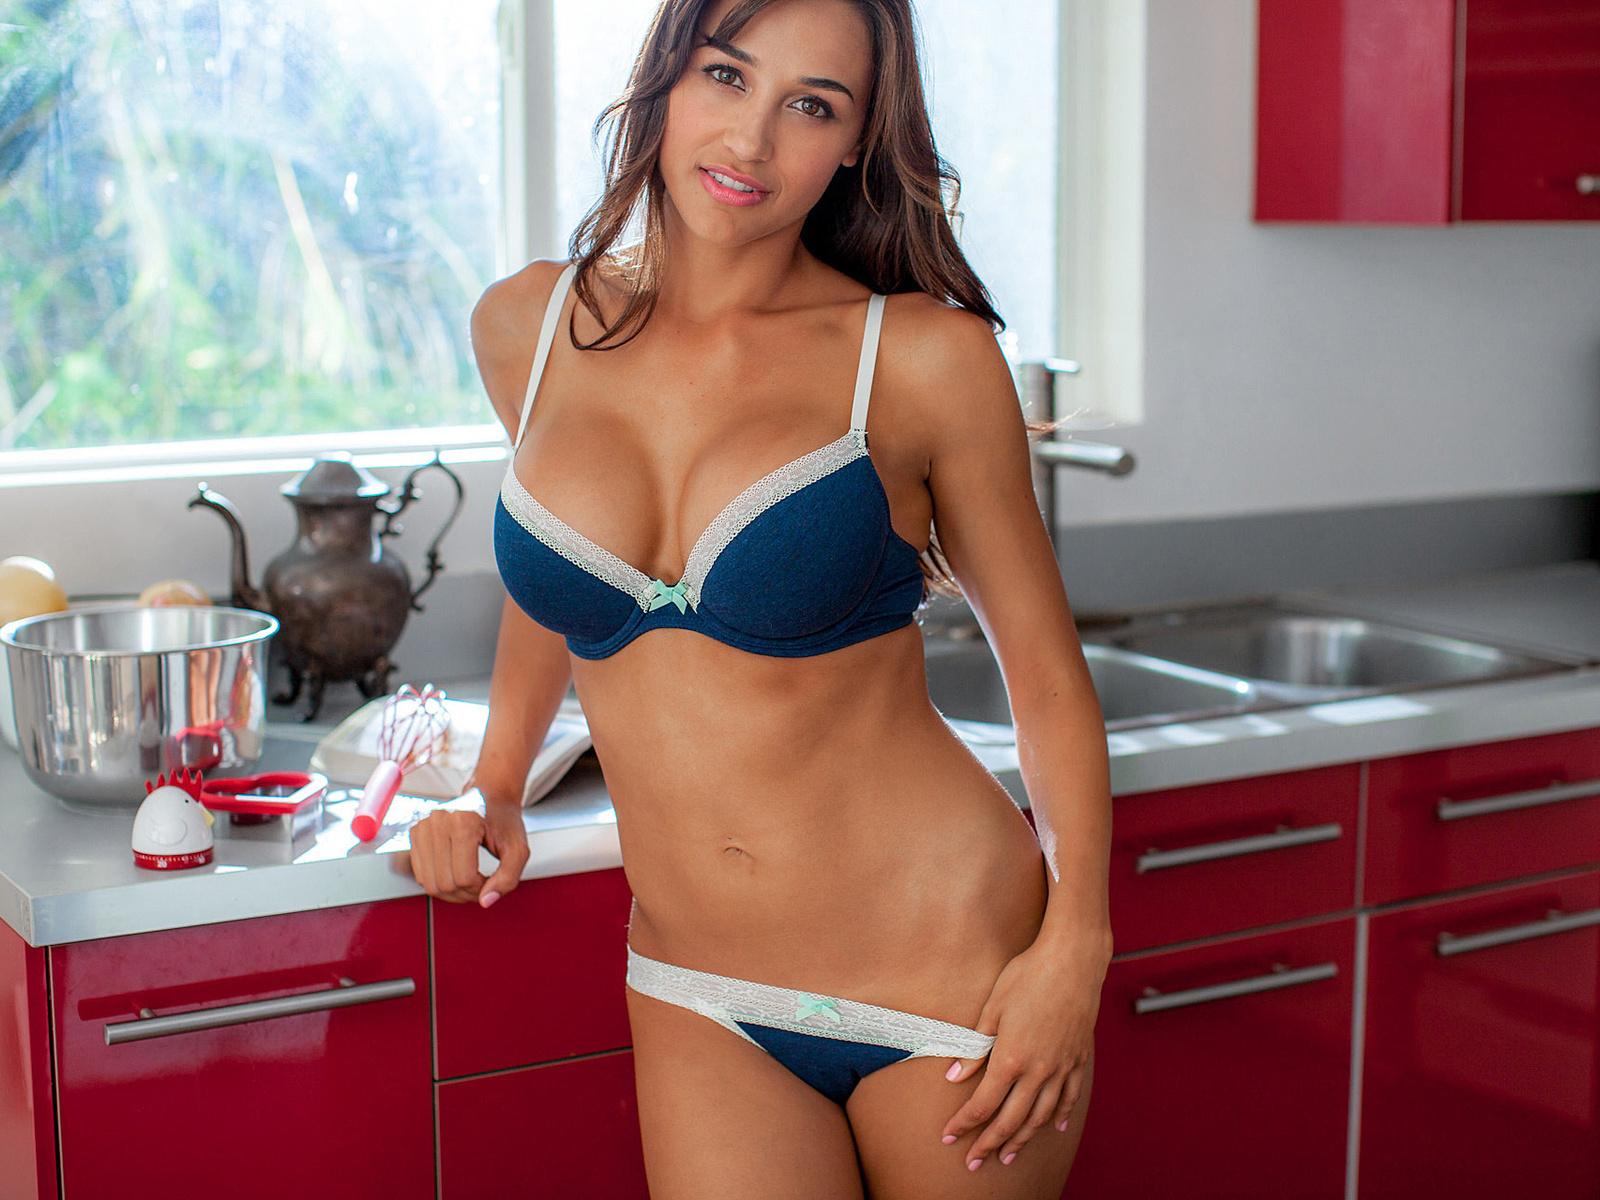 Ana Cheri Full HD